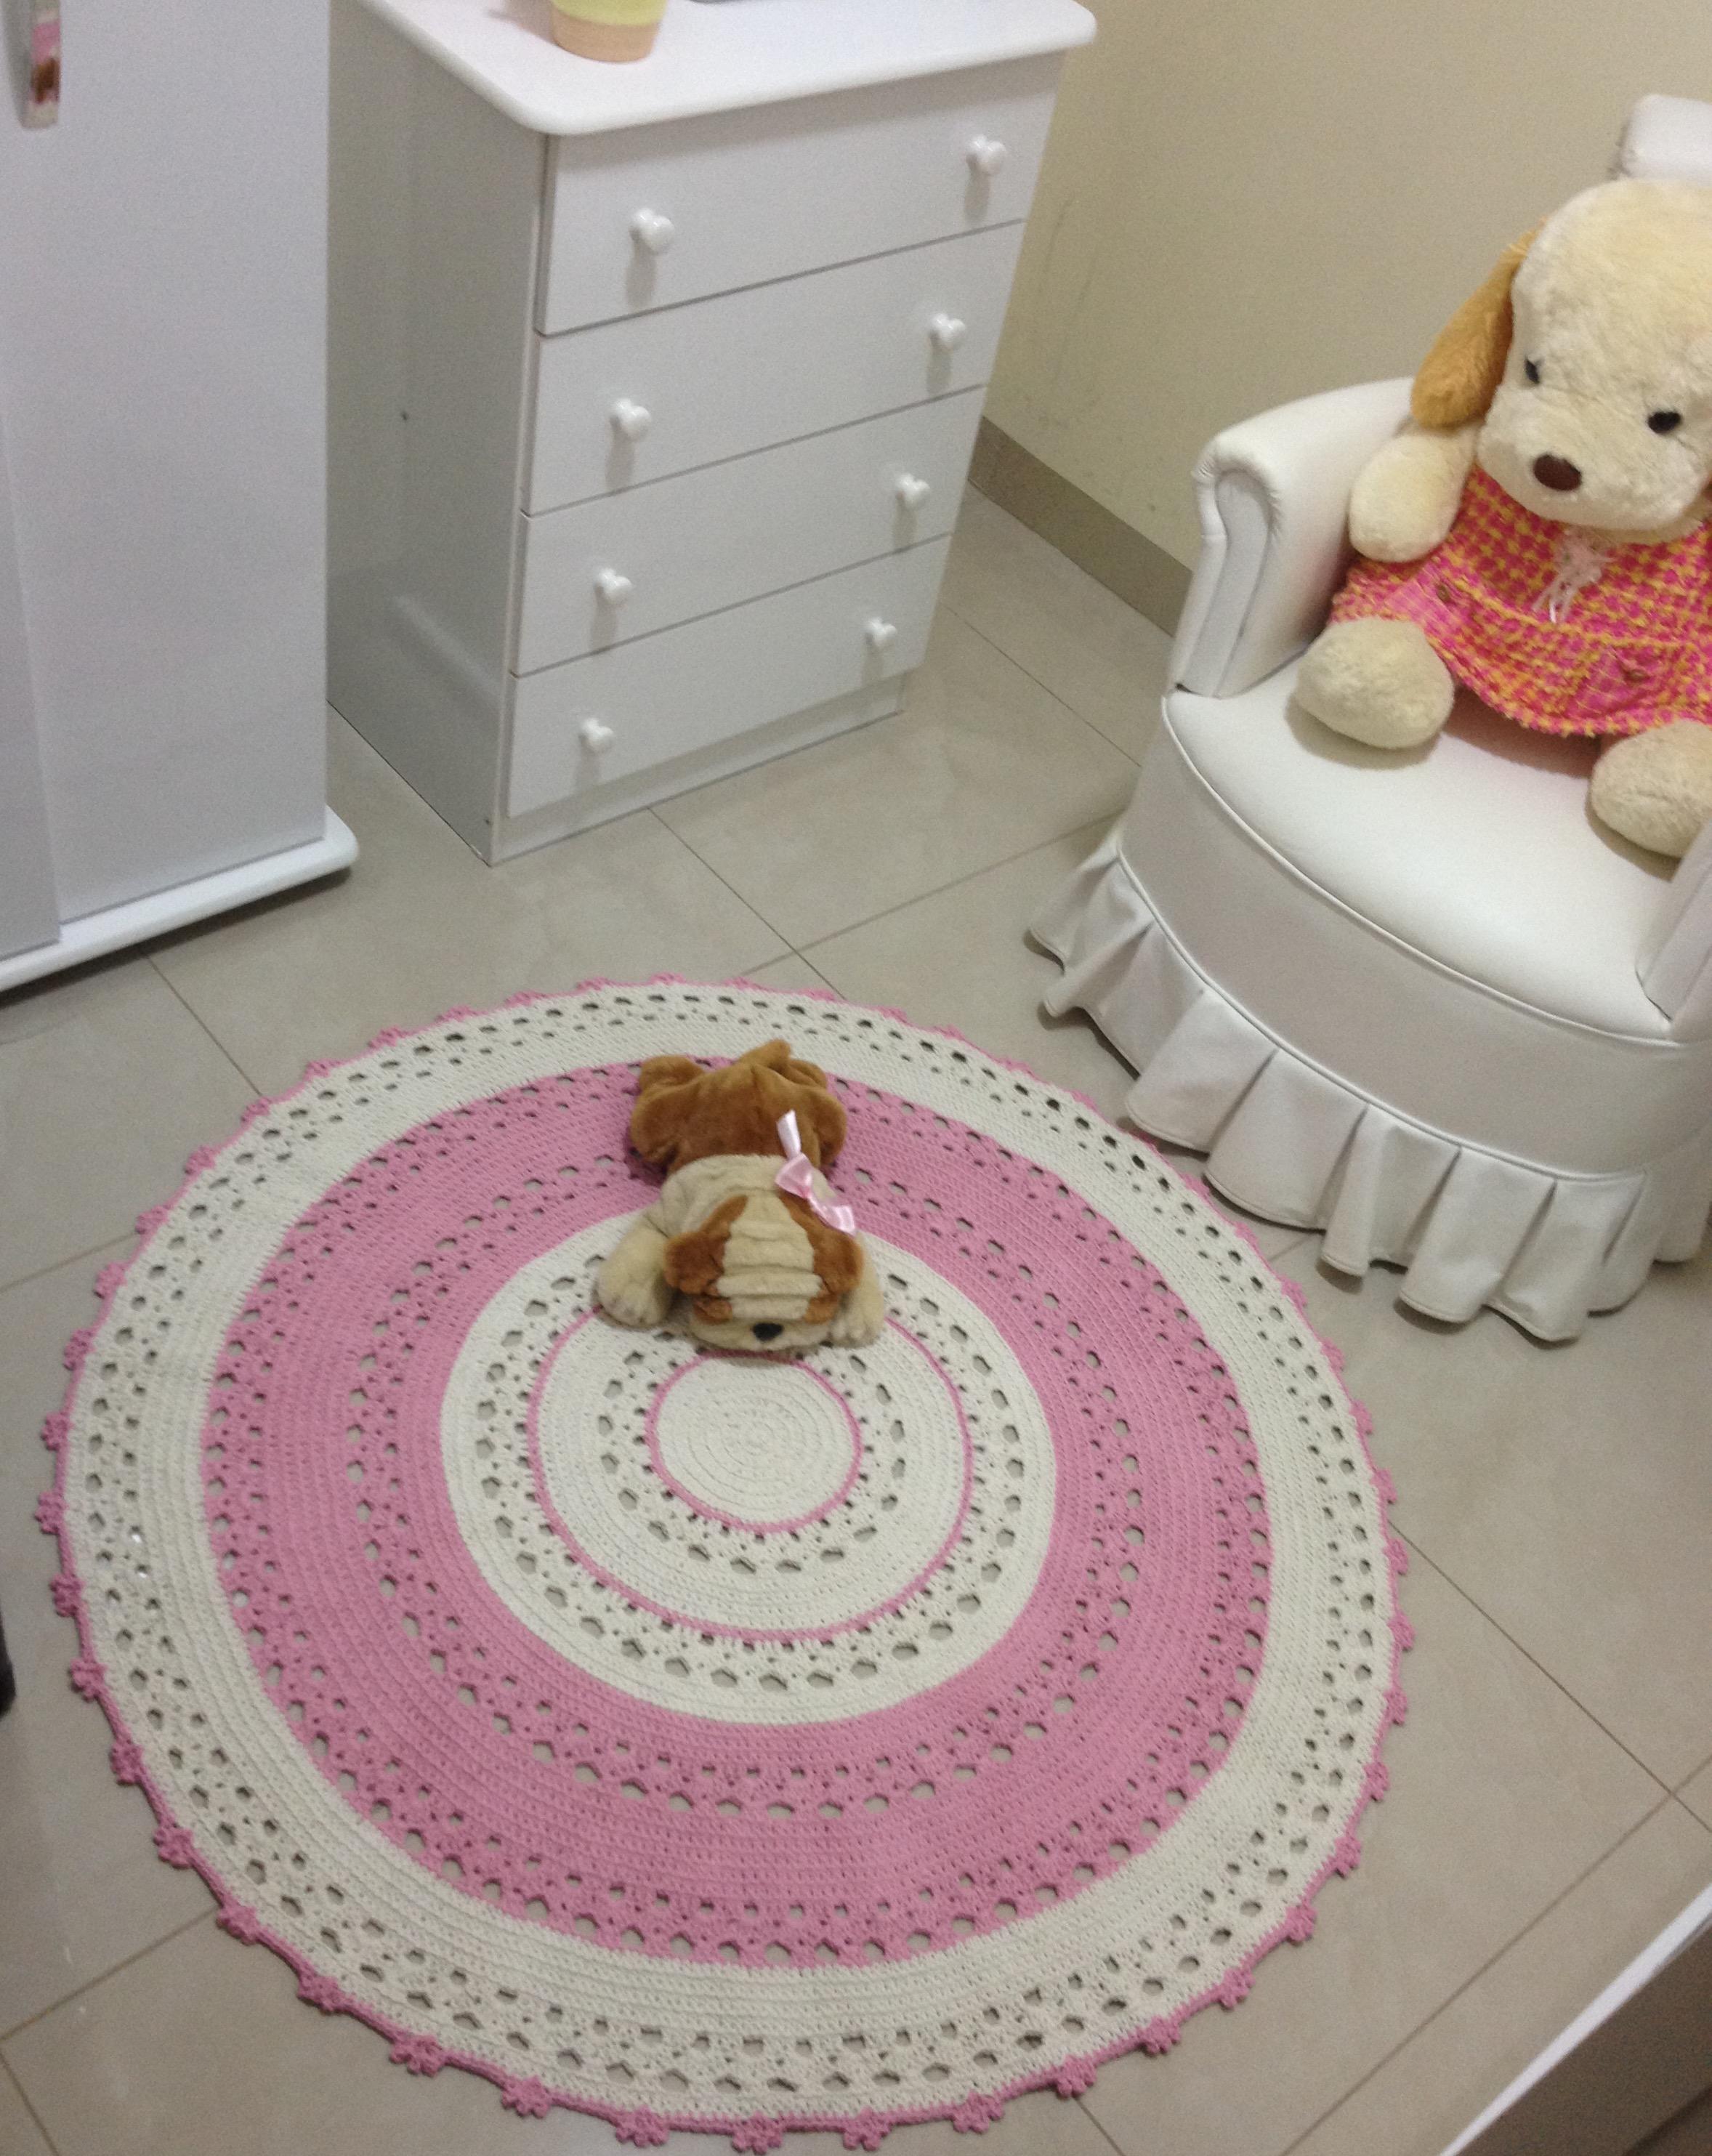 tapete de croche baby karina ateli vera peixoto elo7. Black Bedroom Furniture Sets. Home Design Ideas